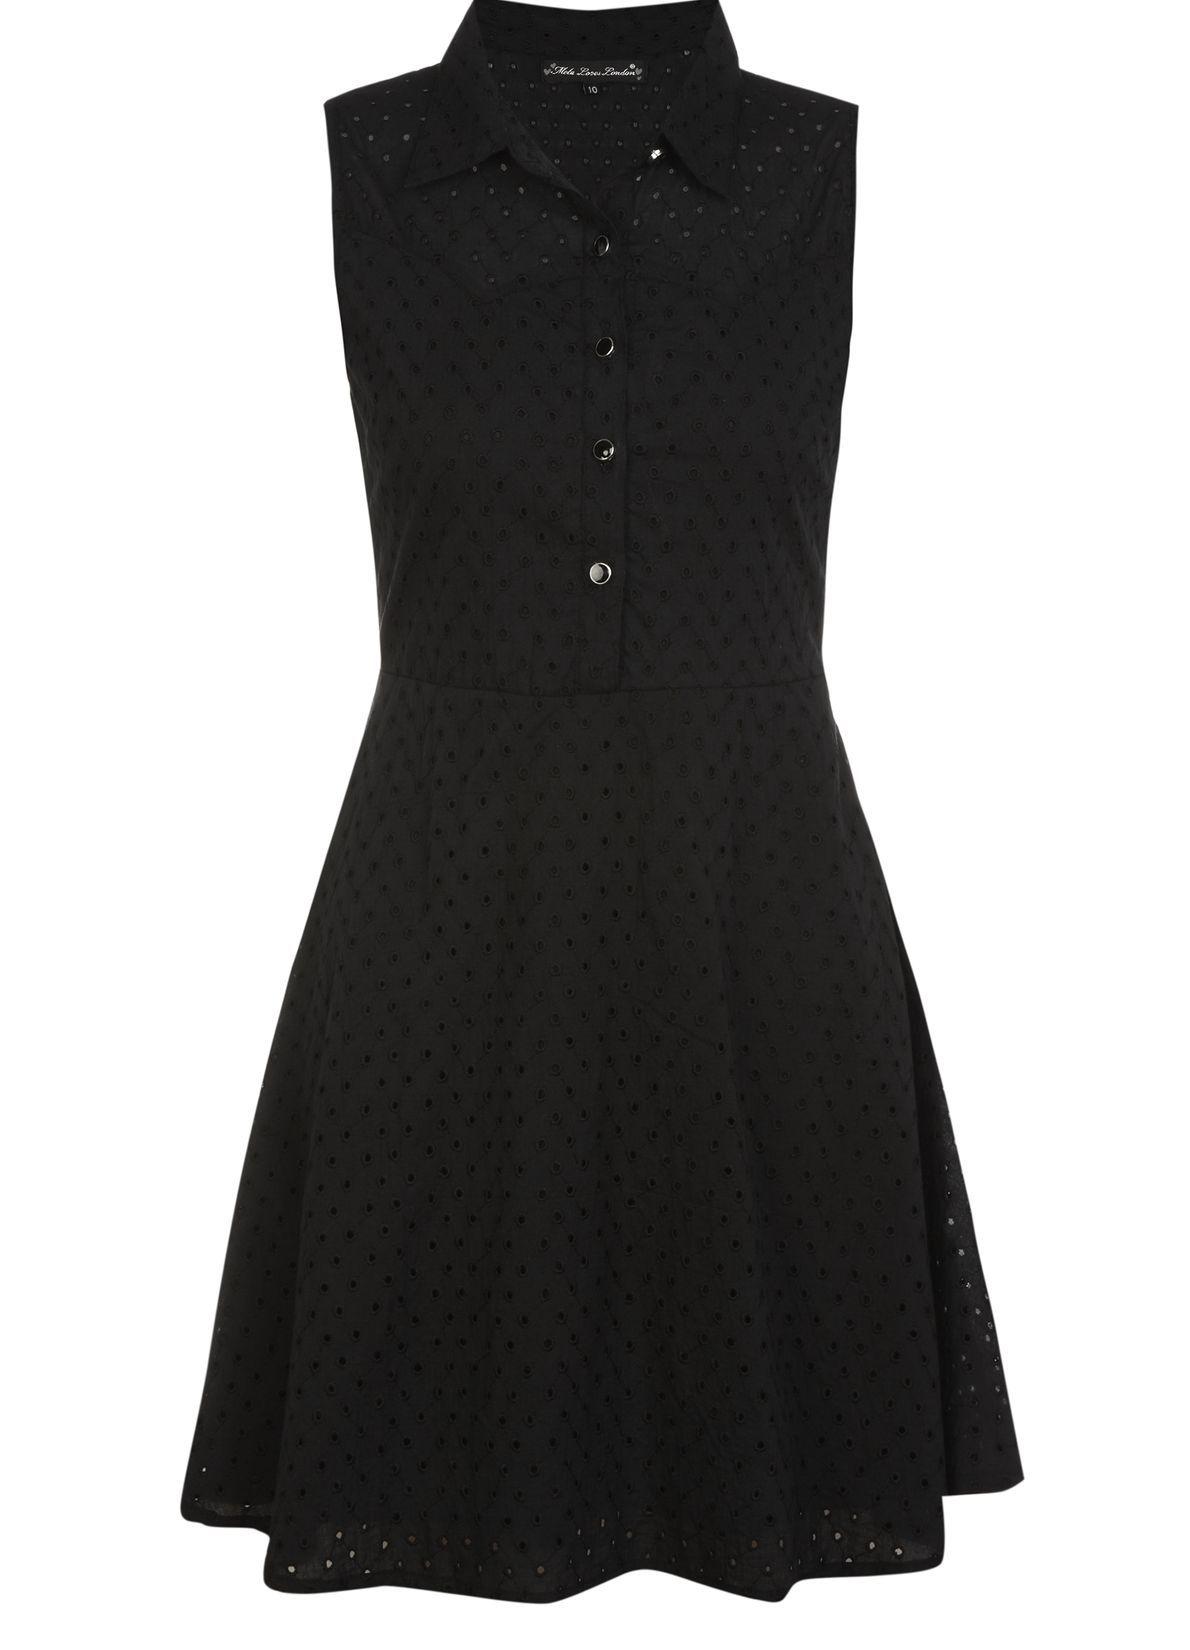 Broderie Anglaise Shirt Dress @Yumi Direct